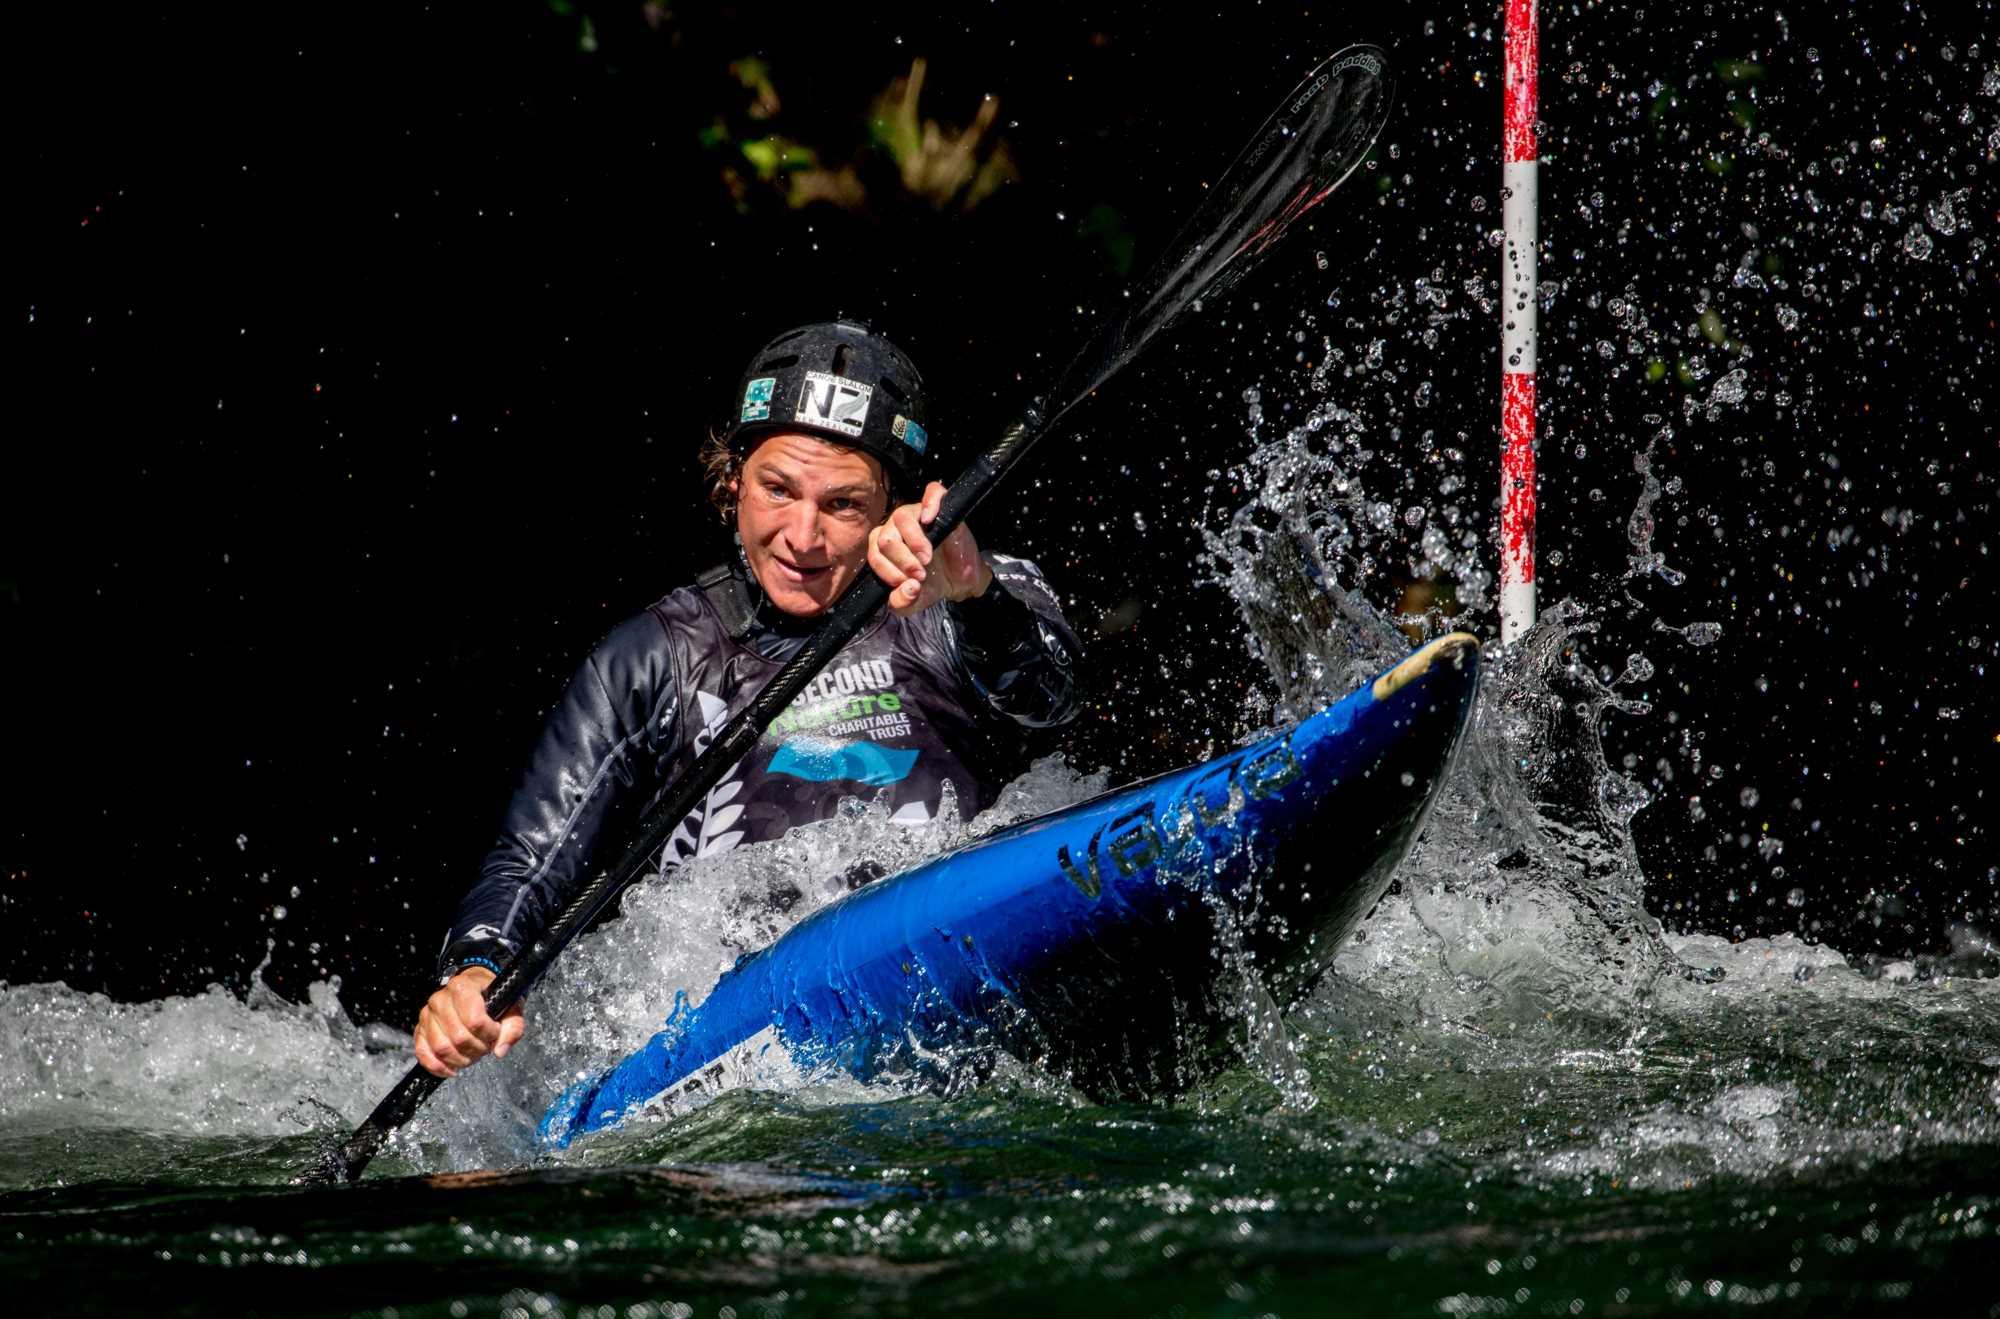 Kiwi kayaker creates World Cup history